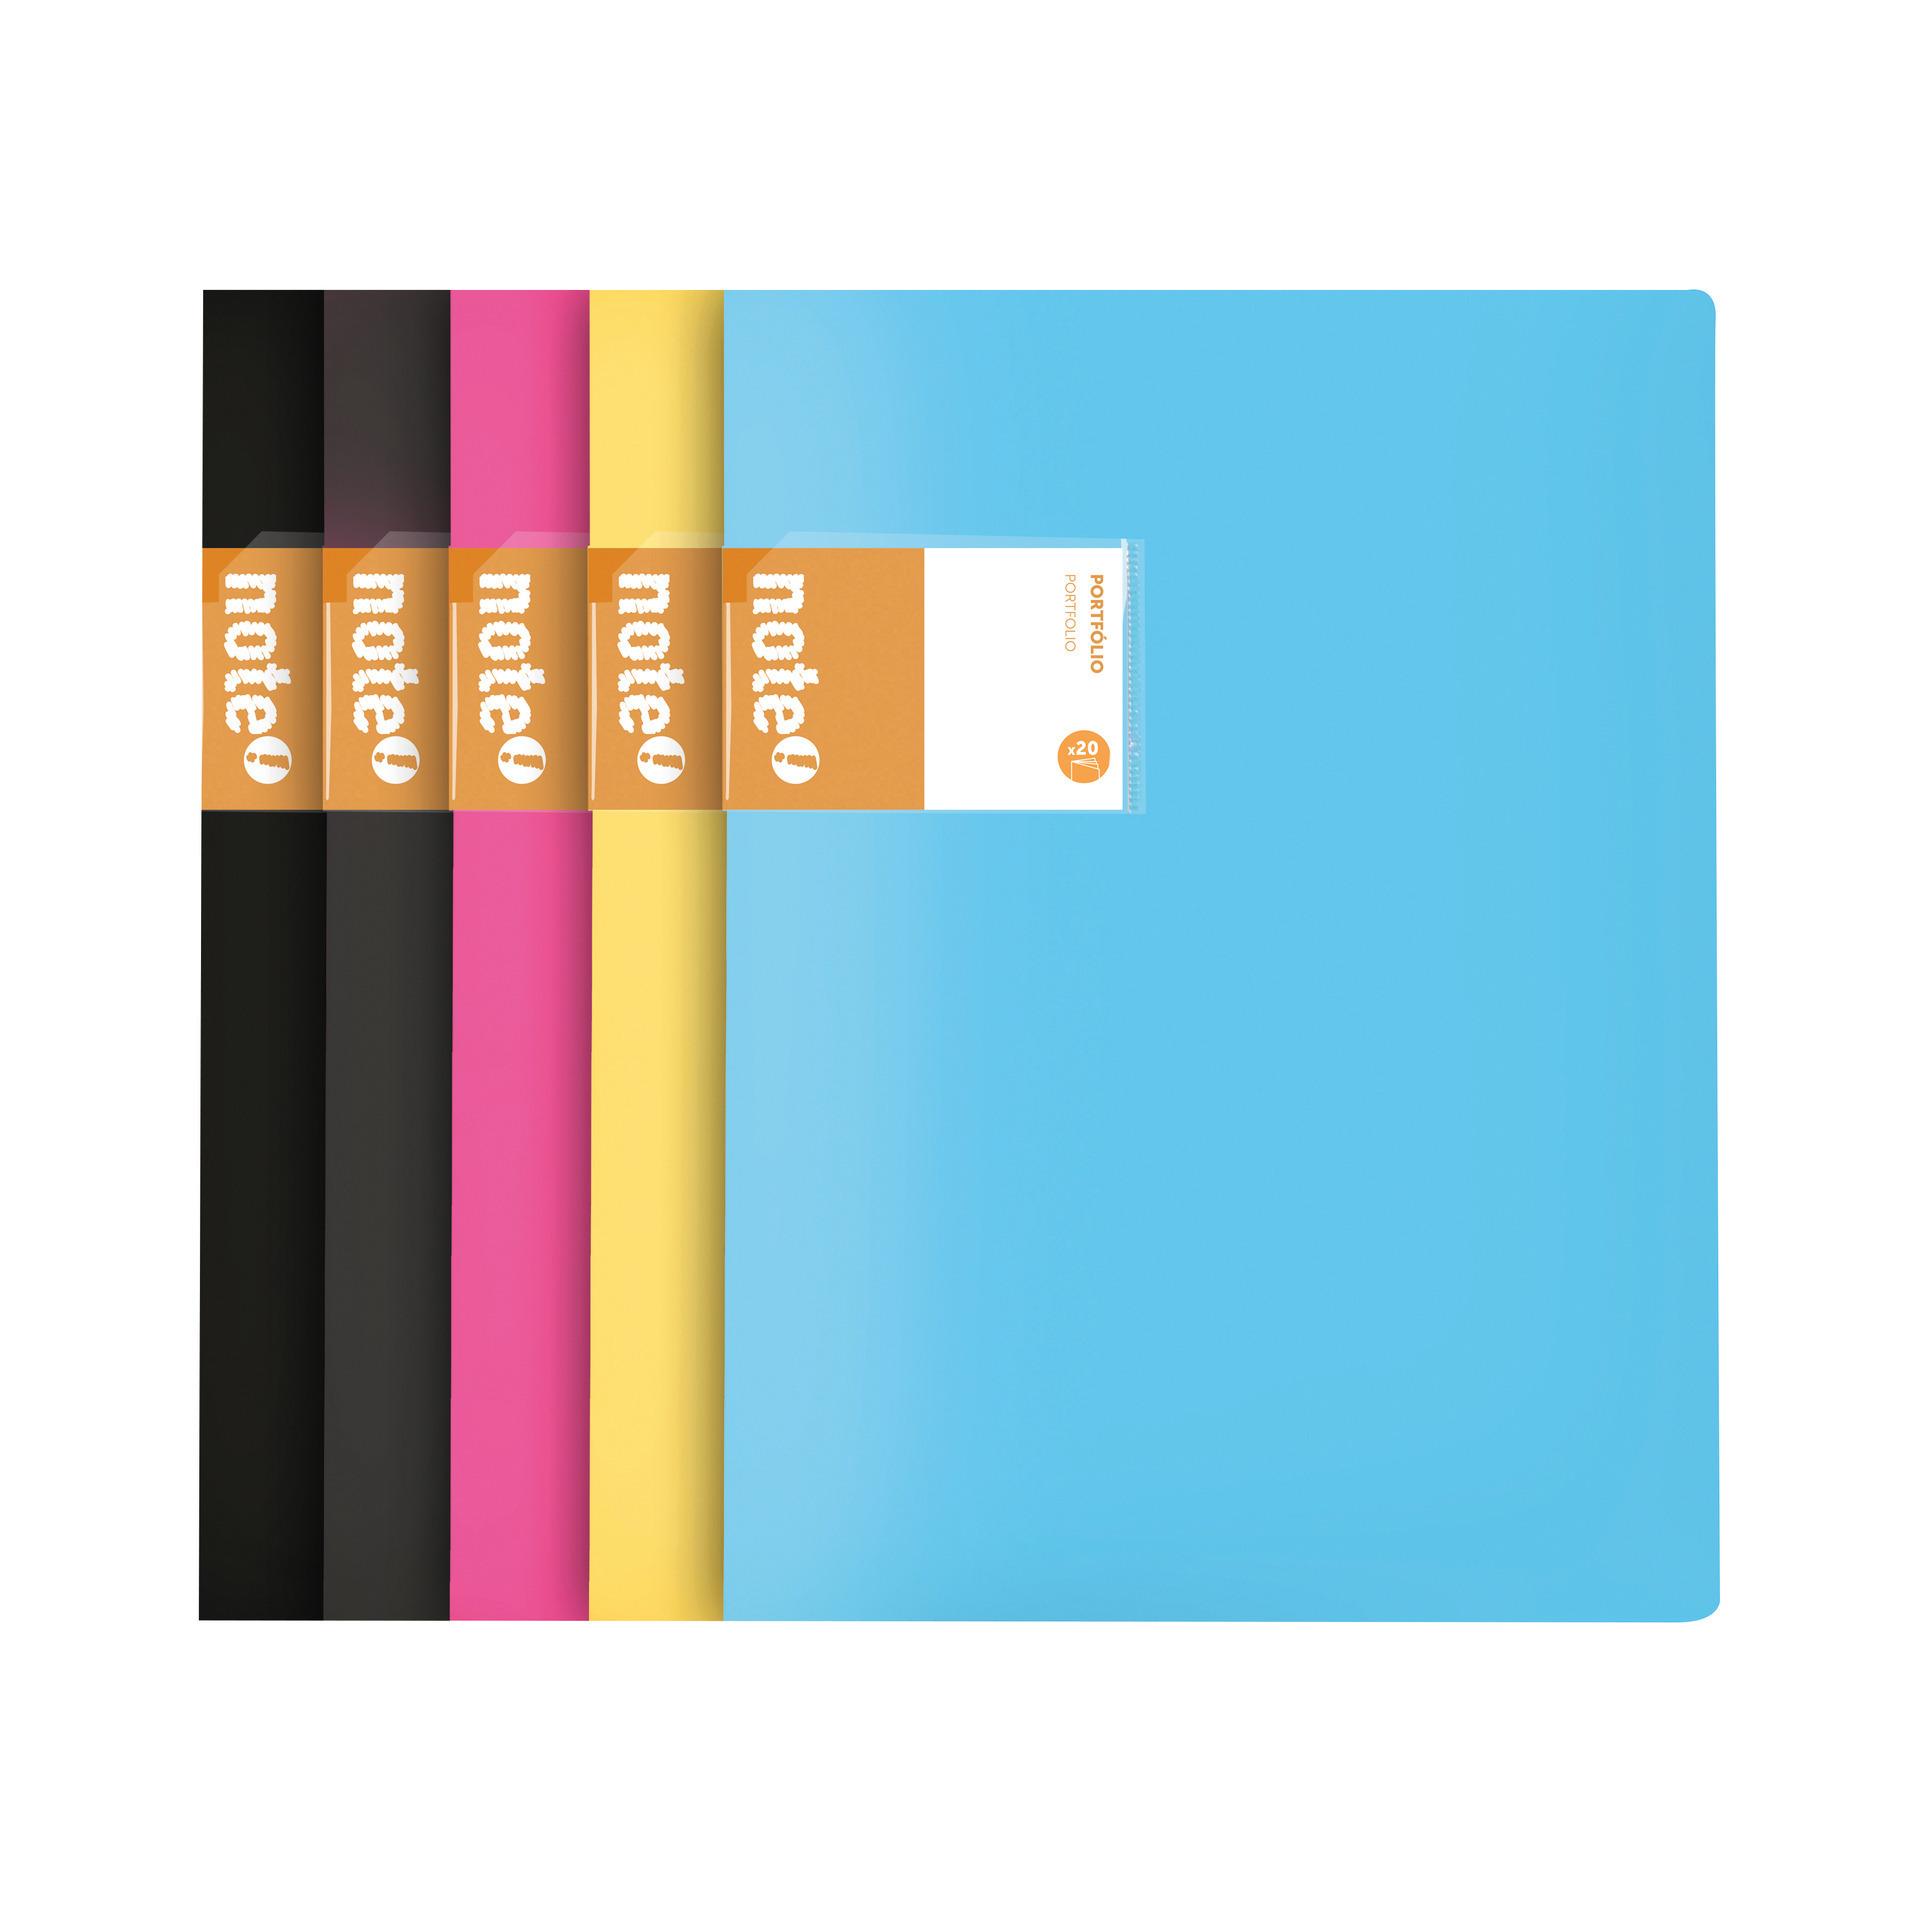 Capa Catálogo 20 Bolsas Neon note! (artigo sortido)